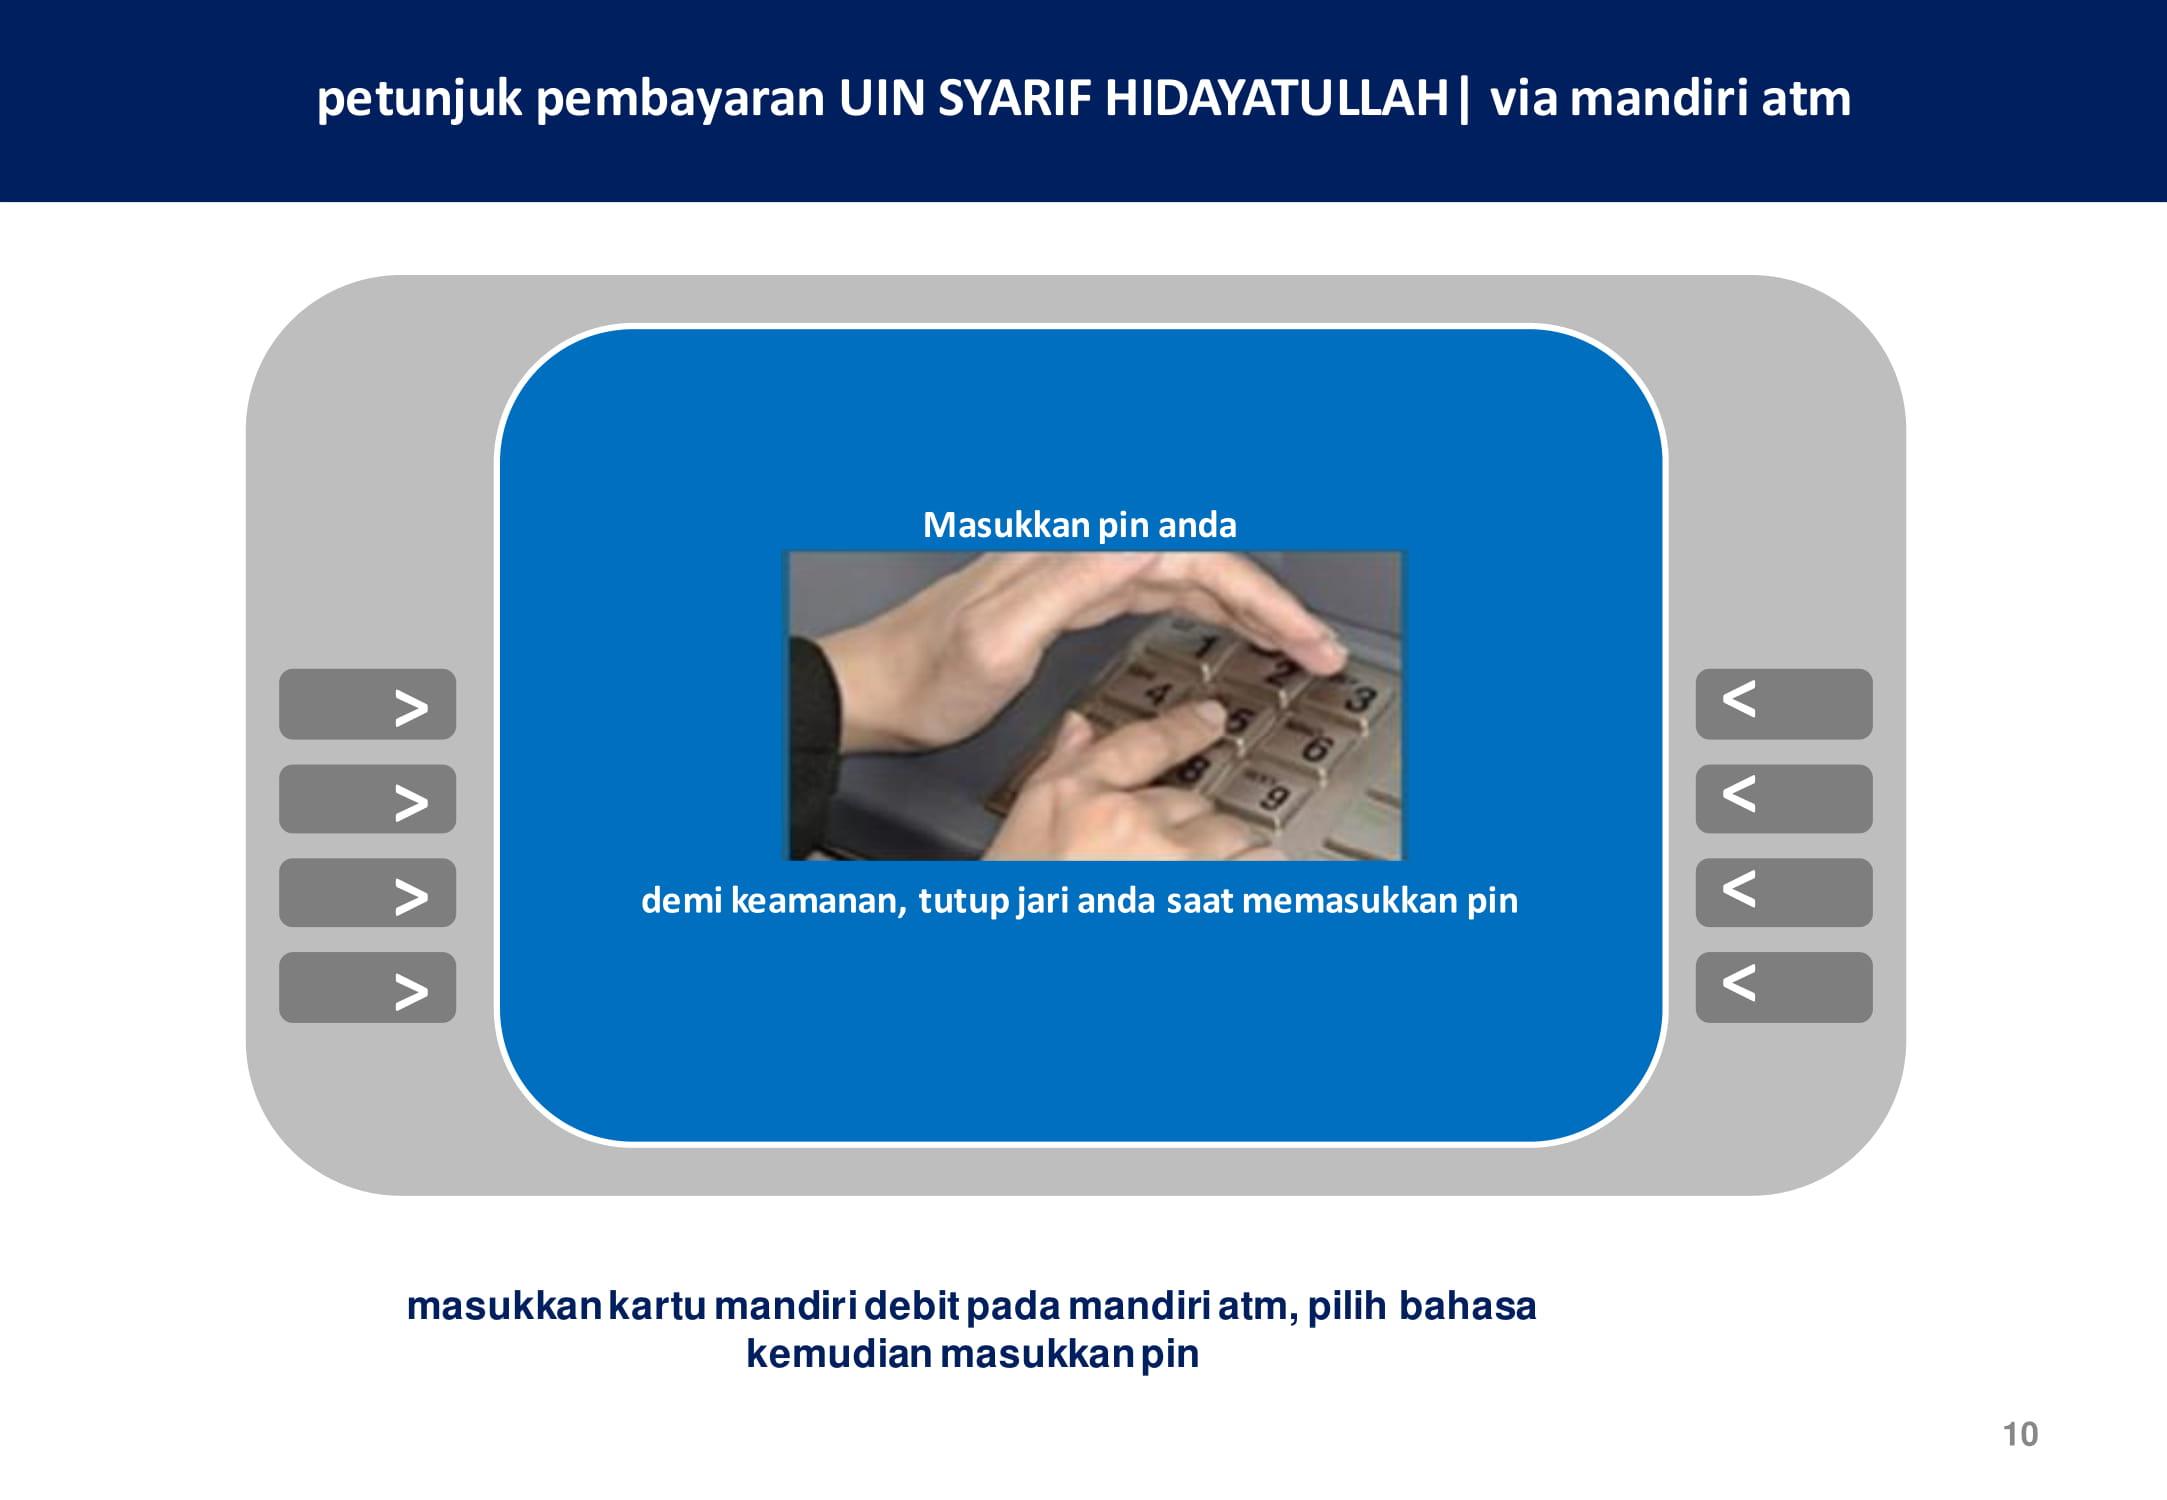 mandiri_atm_step1